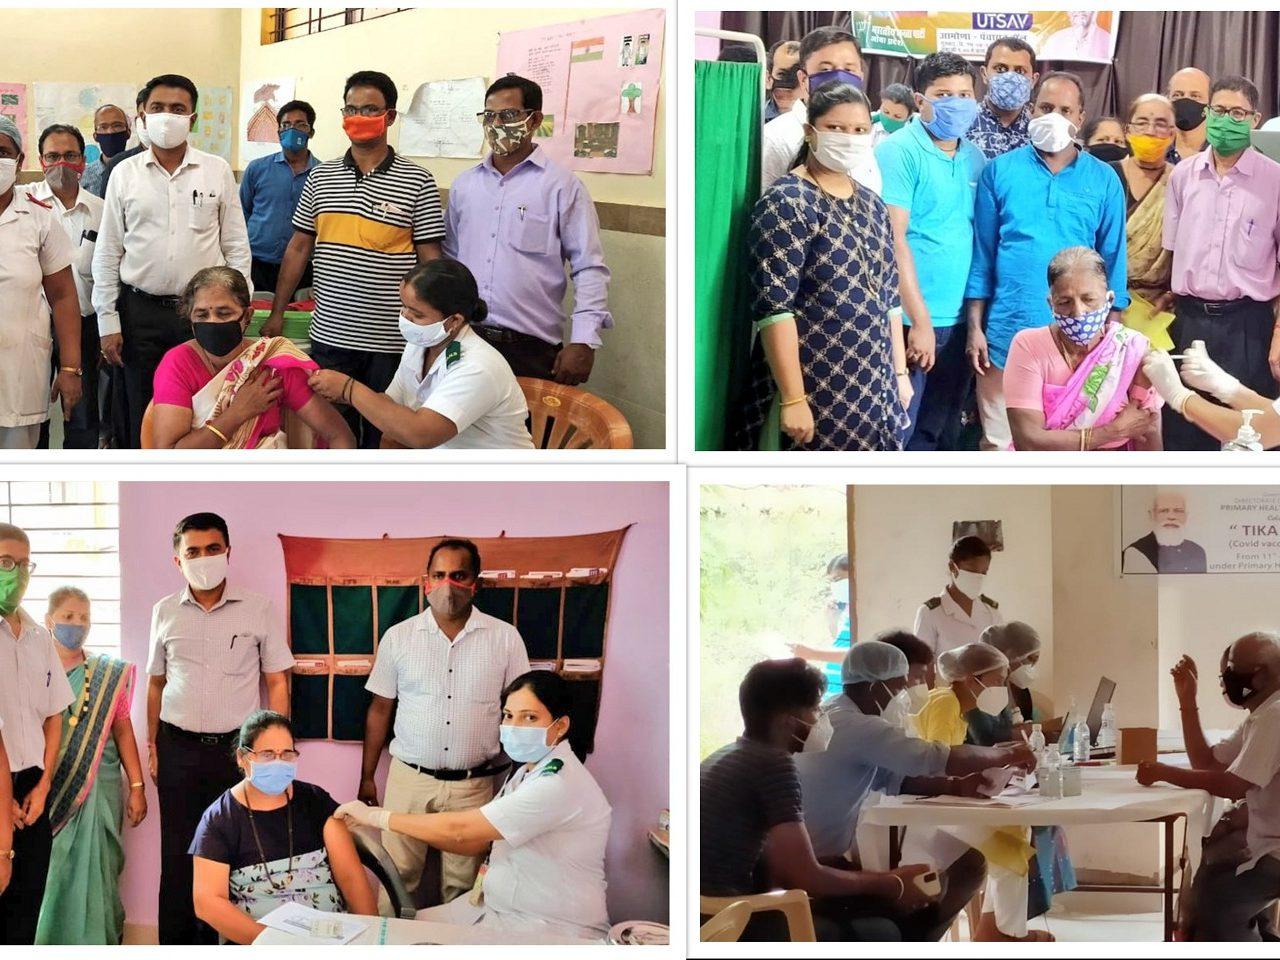 Tika Utsav Vaccination Drive being Conducted in Various Village Panchayats Across Goa